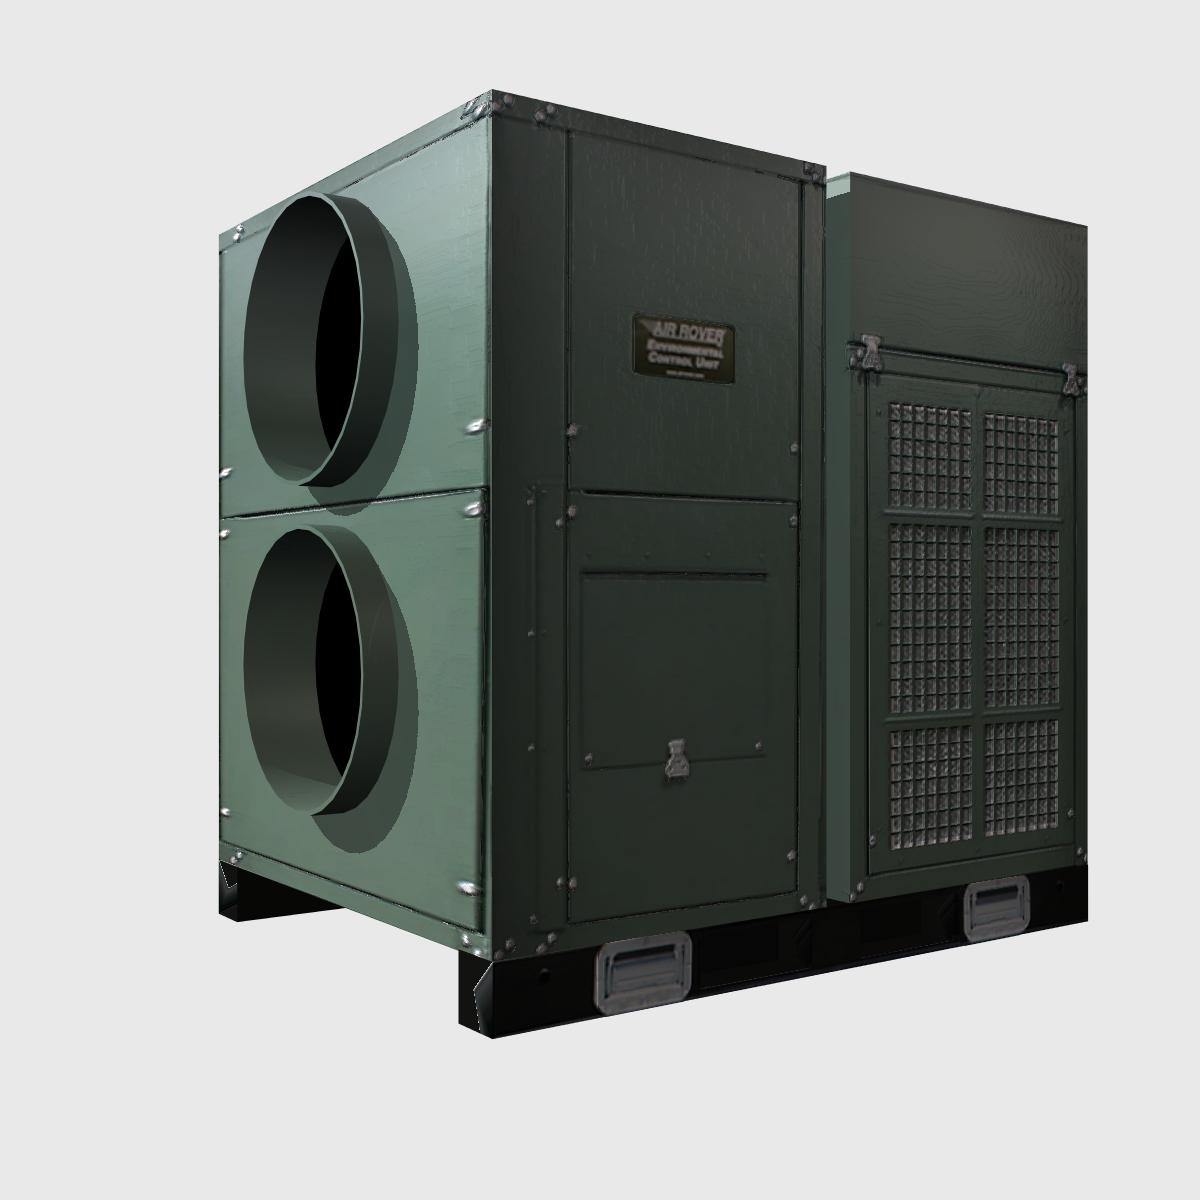 hvac air rover unit 3d model 3ds dxf cob x obj 153093